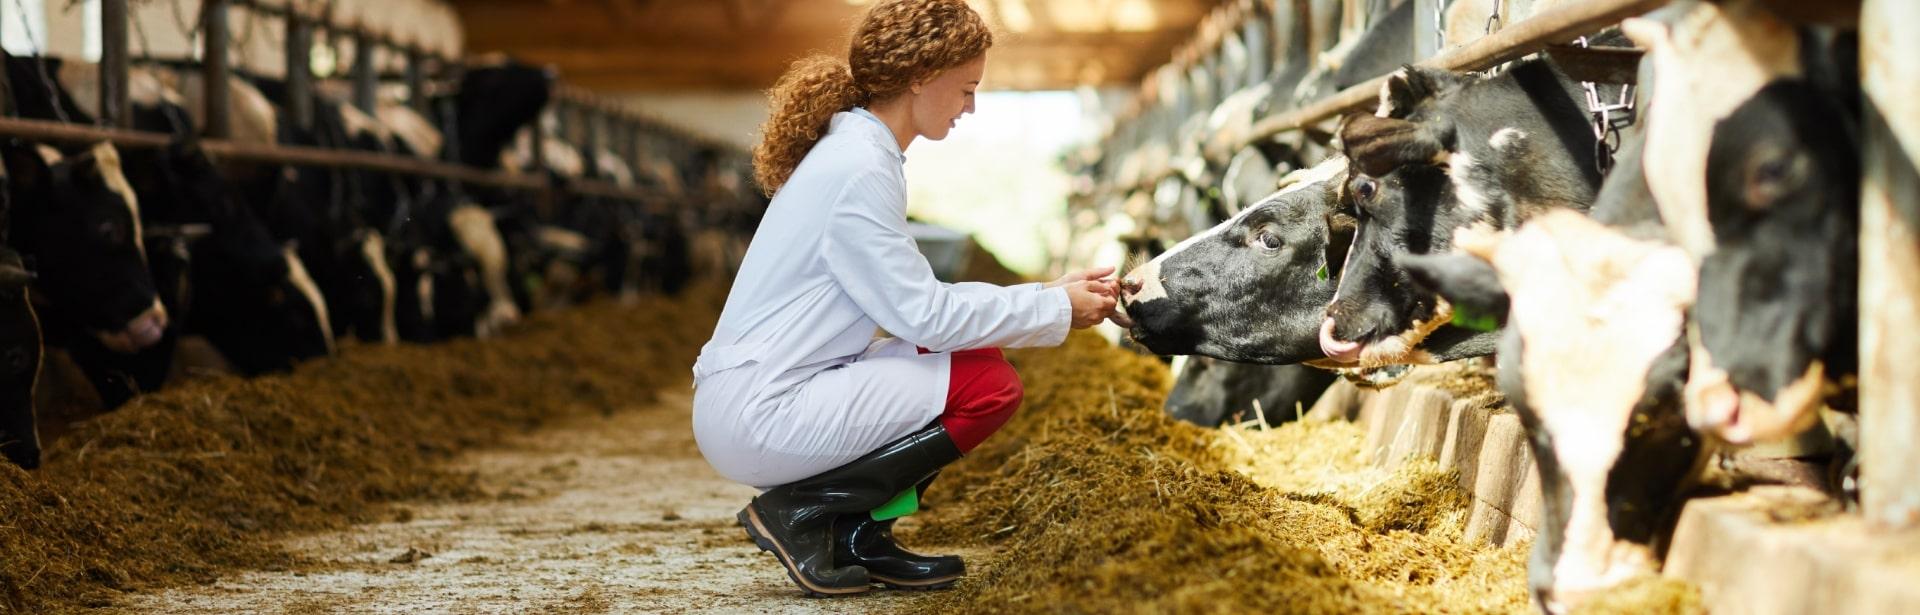 Eurofins Animal Genomics Services